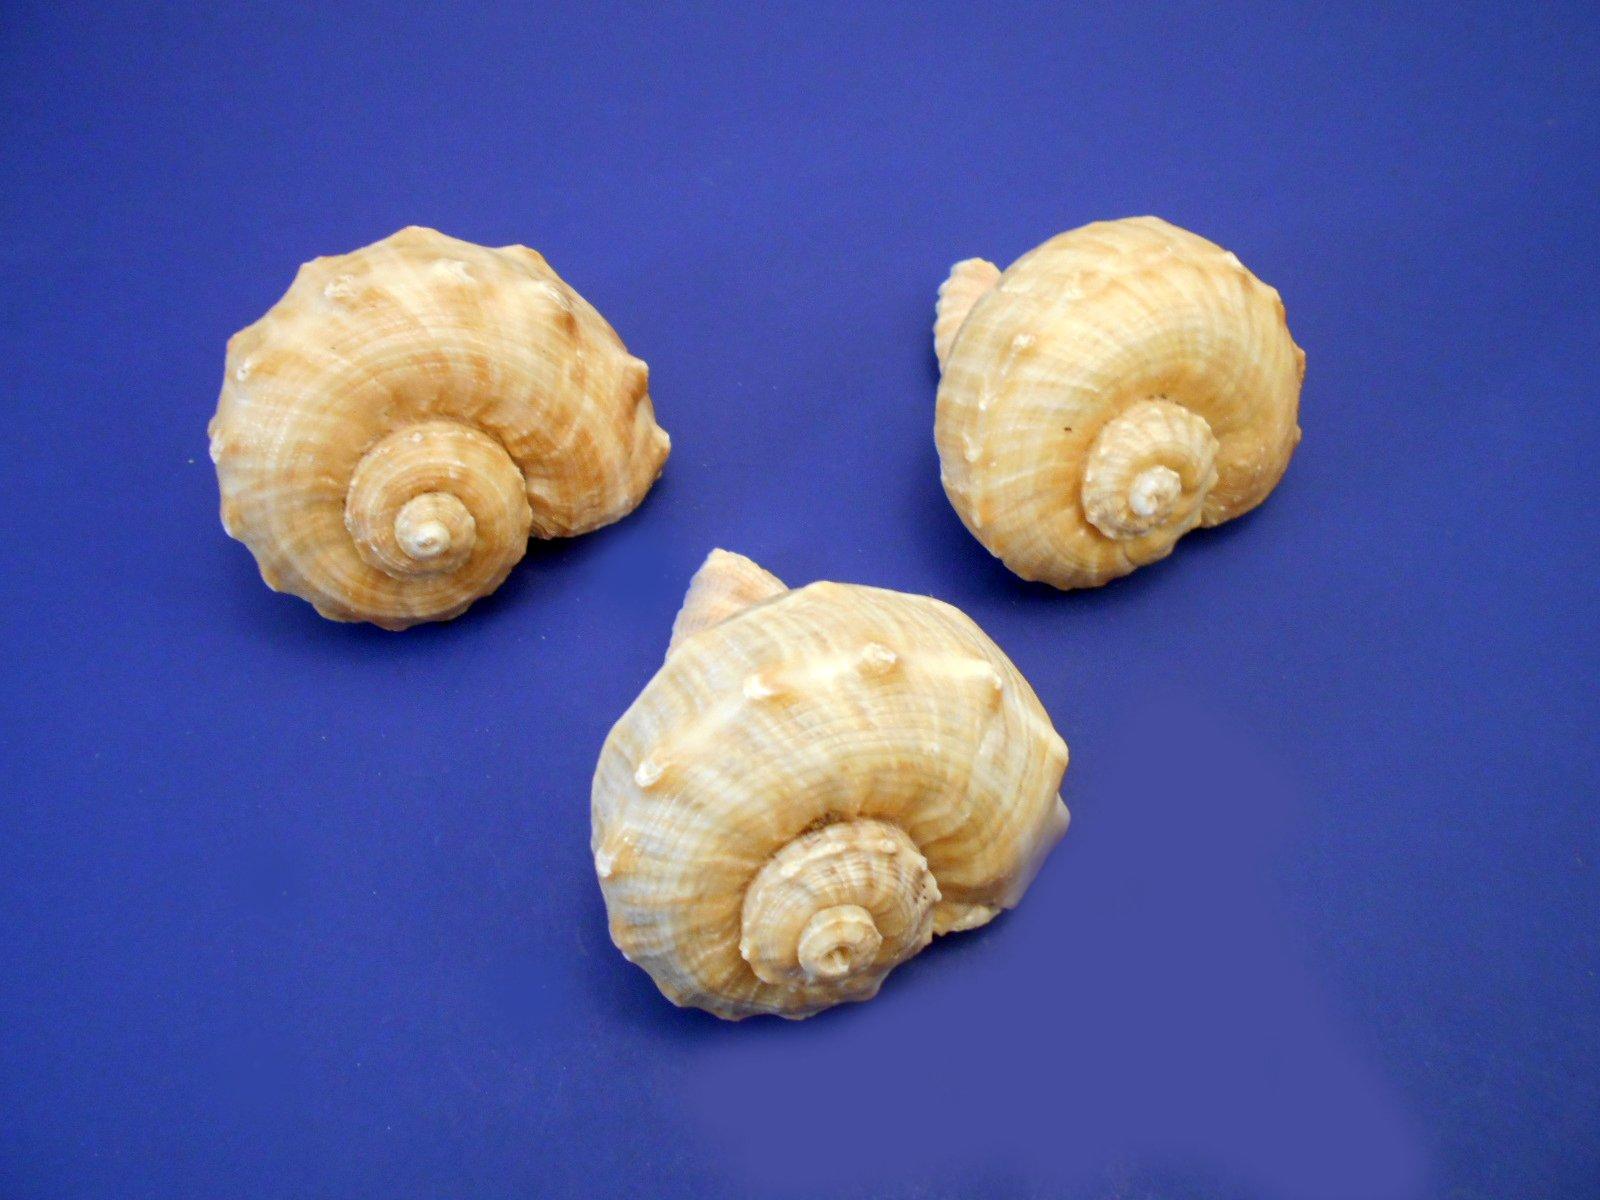 "Florida Shells and Gifts Inc. 3 Large Rapana Whelk Shells Seashells 2""- 3"" Sea Shell Hermit Crab Beach Nautical"